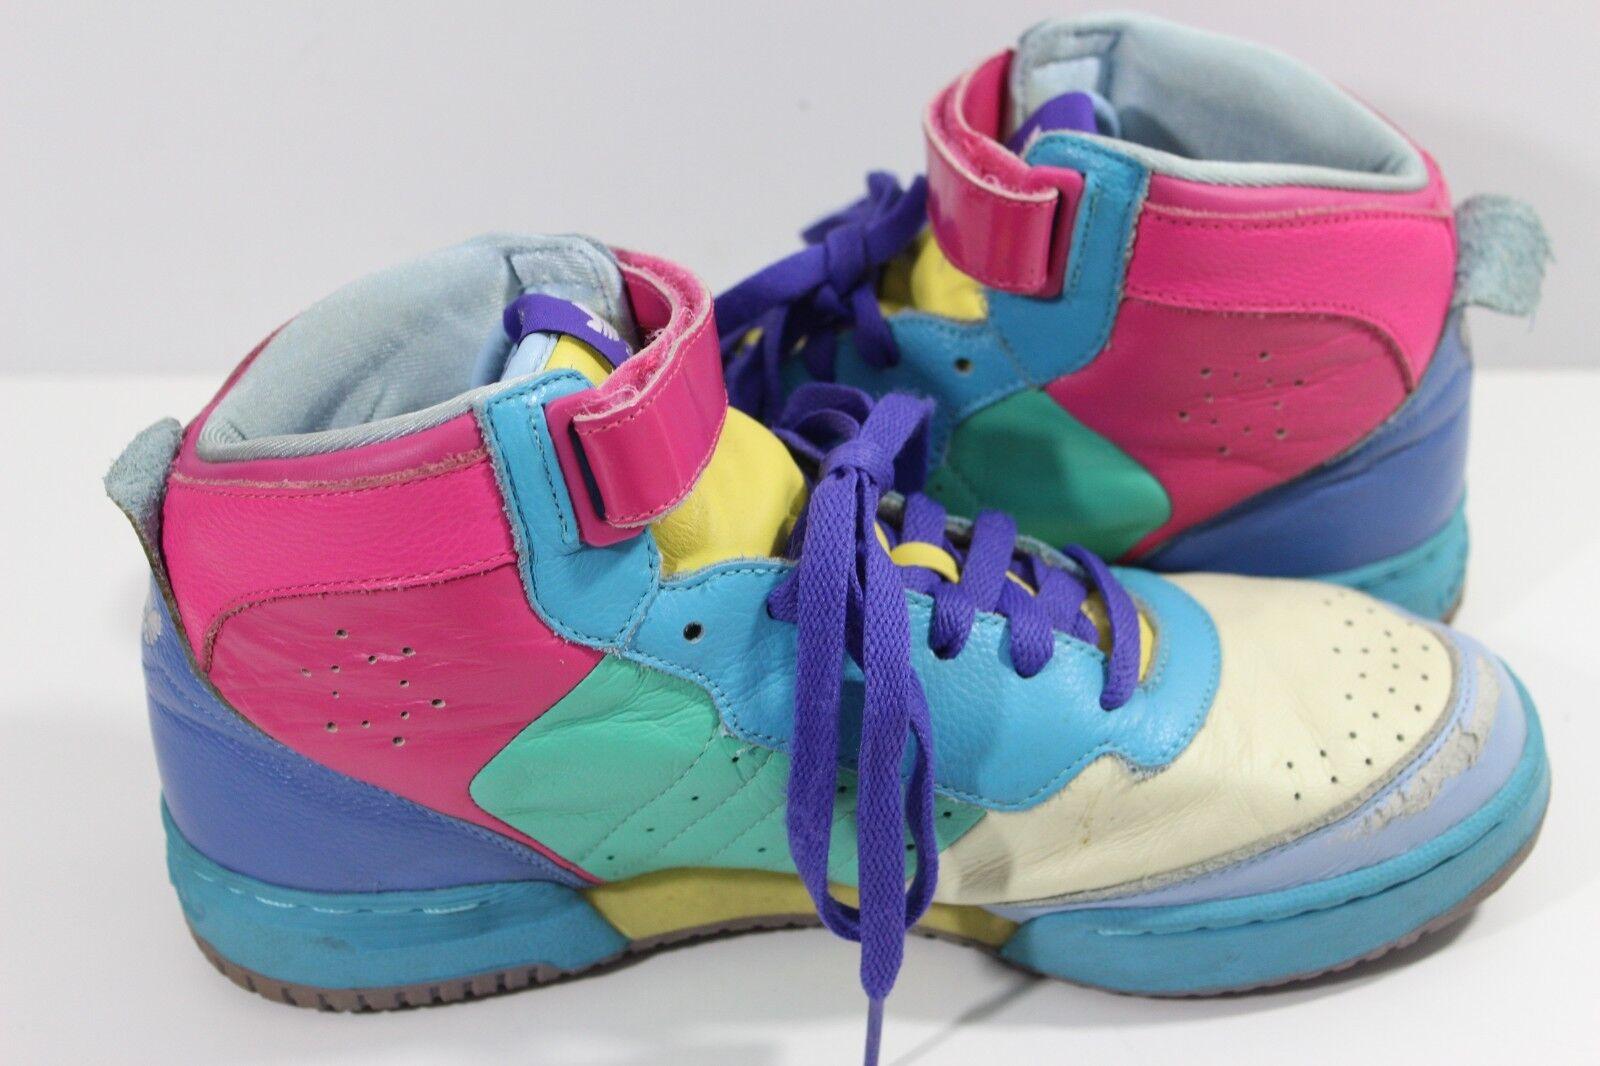 Adidas 020054 Grace Mid Mehrfarbig Athletic Fashion Sneakers Damen US 8.5 (W)